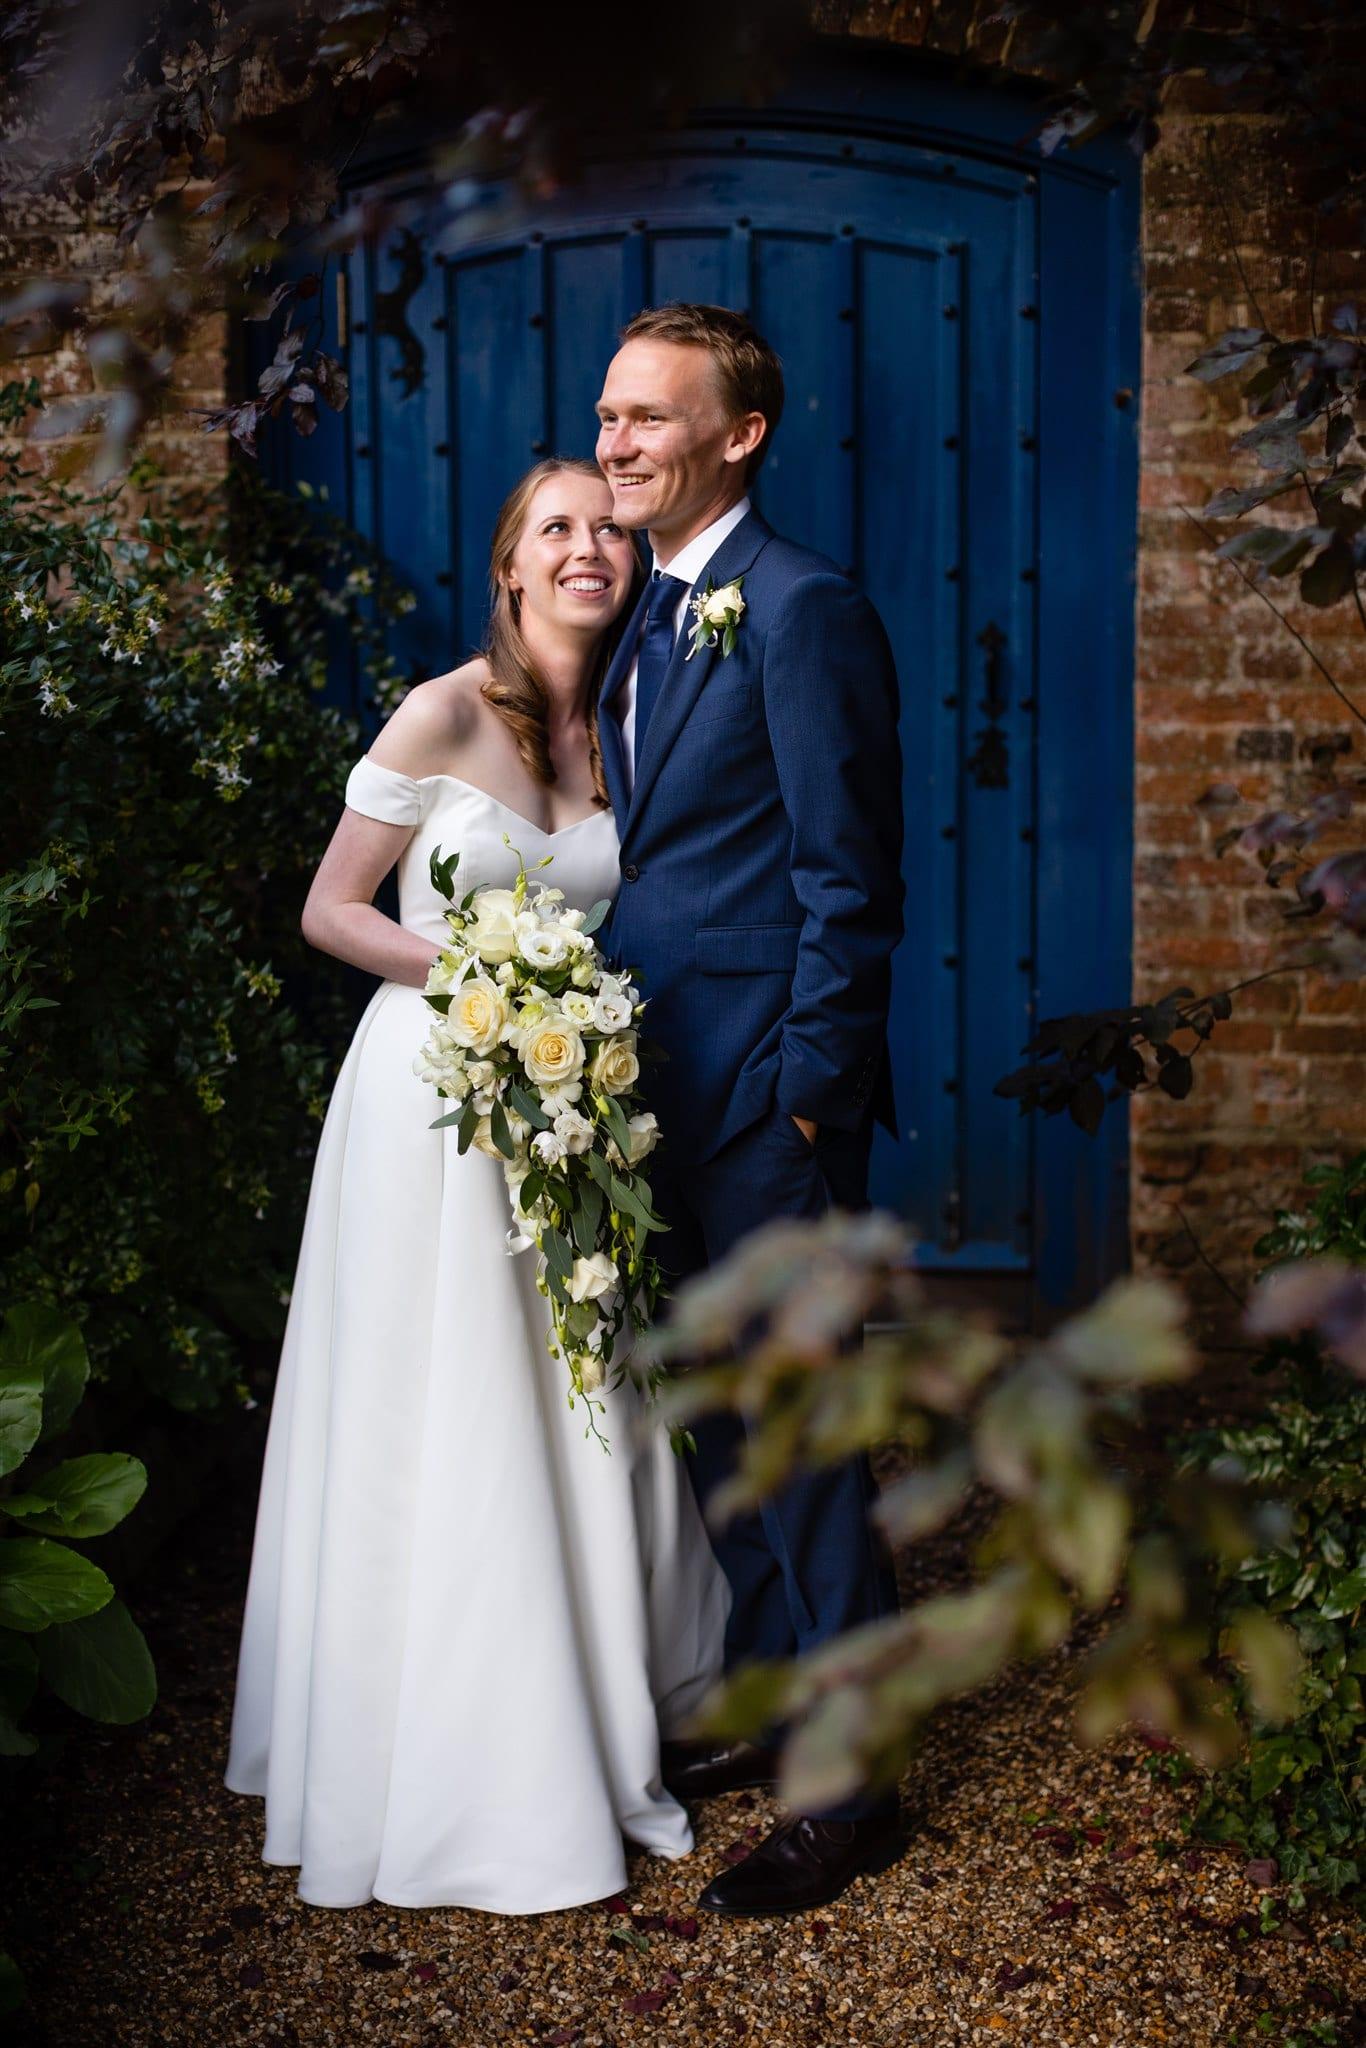 Wedding photo opportunities at Farnham Castle in Surrey